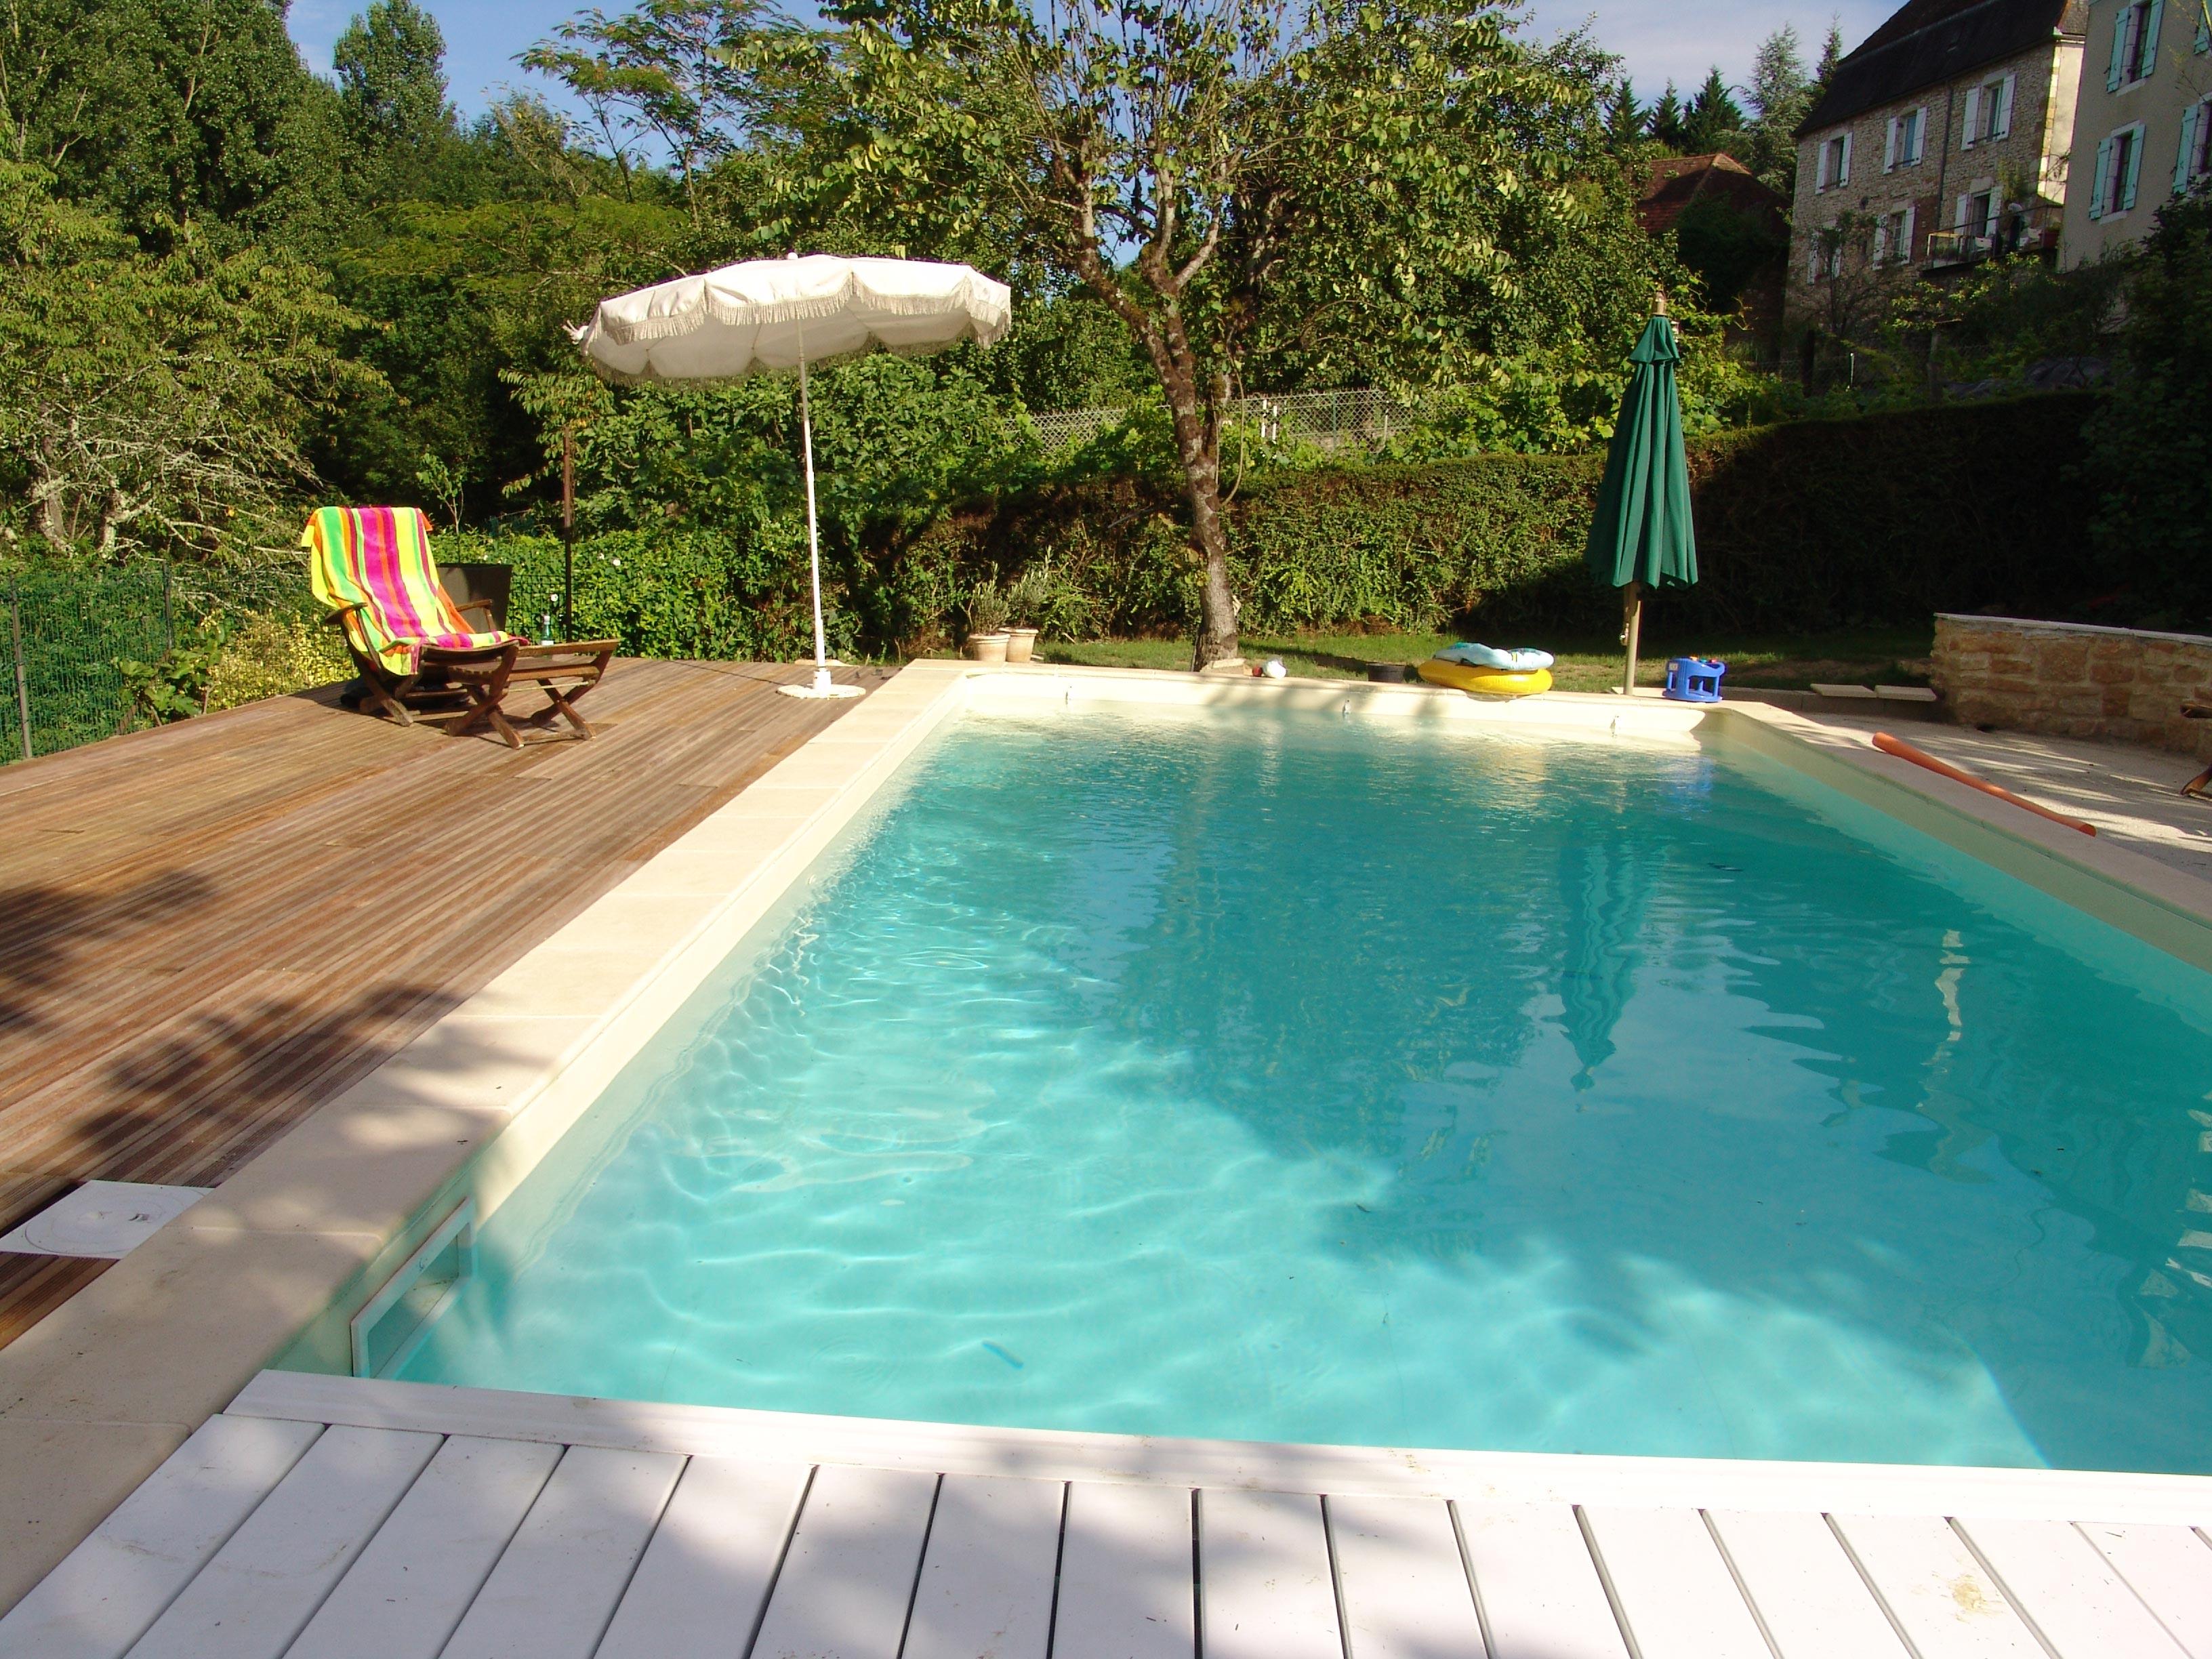 piscine de jardin vacances arts guides voyages. Black Bedroom Furniture Sets. Home Design Ideas